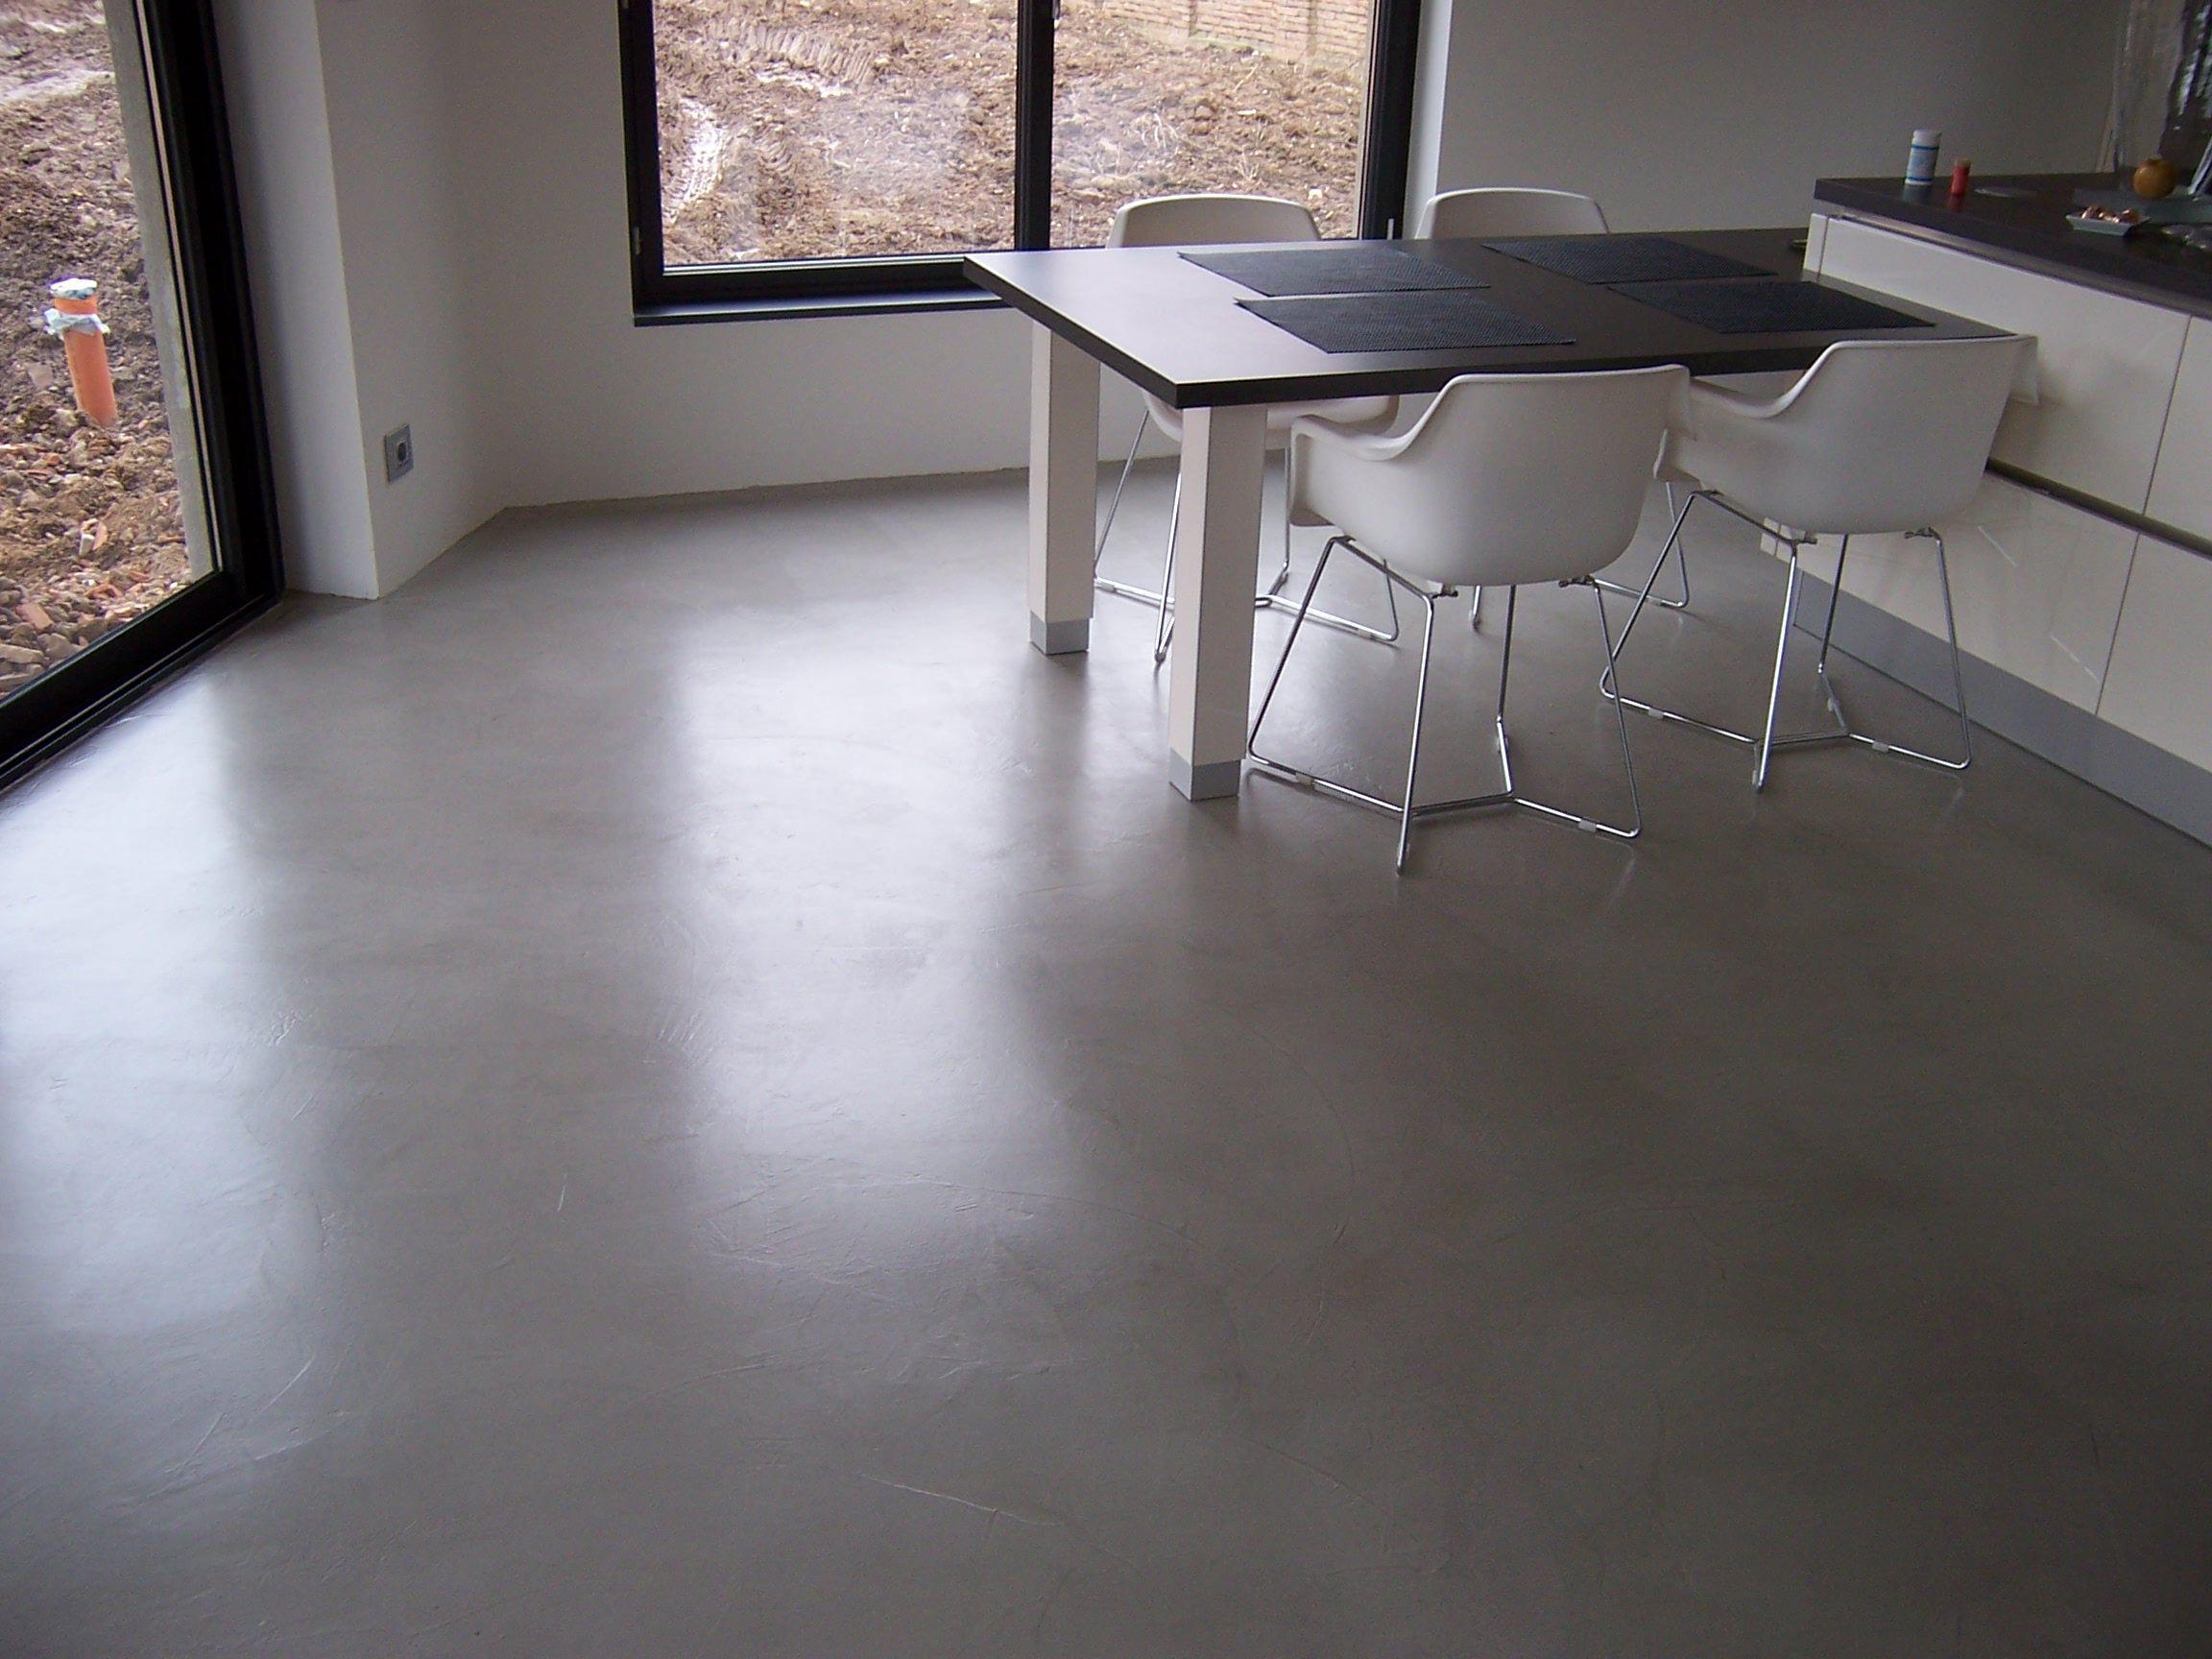 sol cuisine bton cir bton cir brillant effet marbre sol en bton cir dune cuisine beton cire. Black Bedroom Furniture Sets. Home Design Ideas